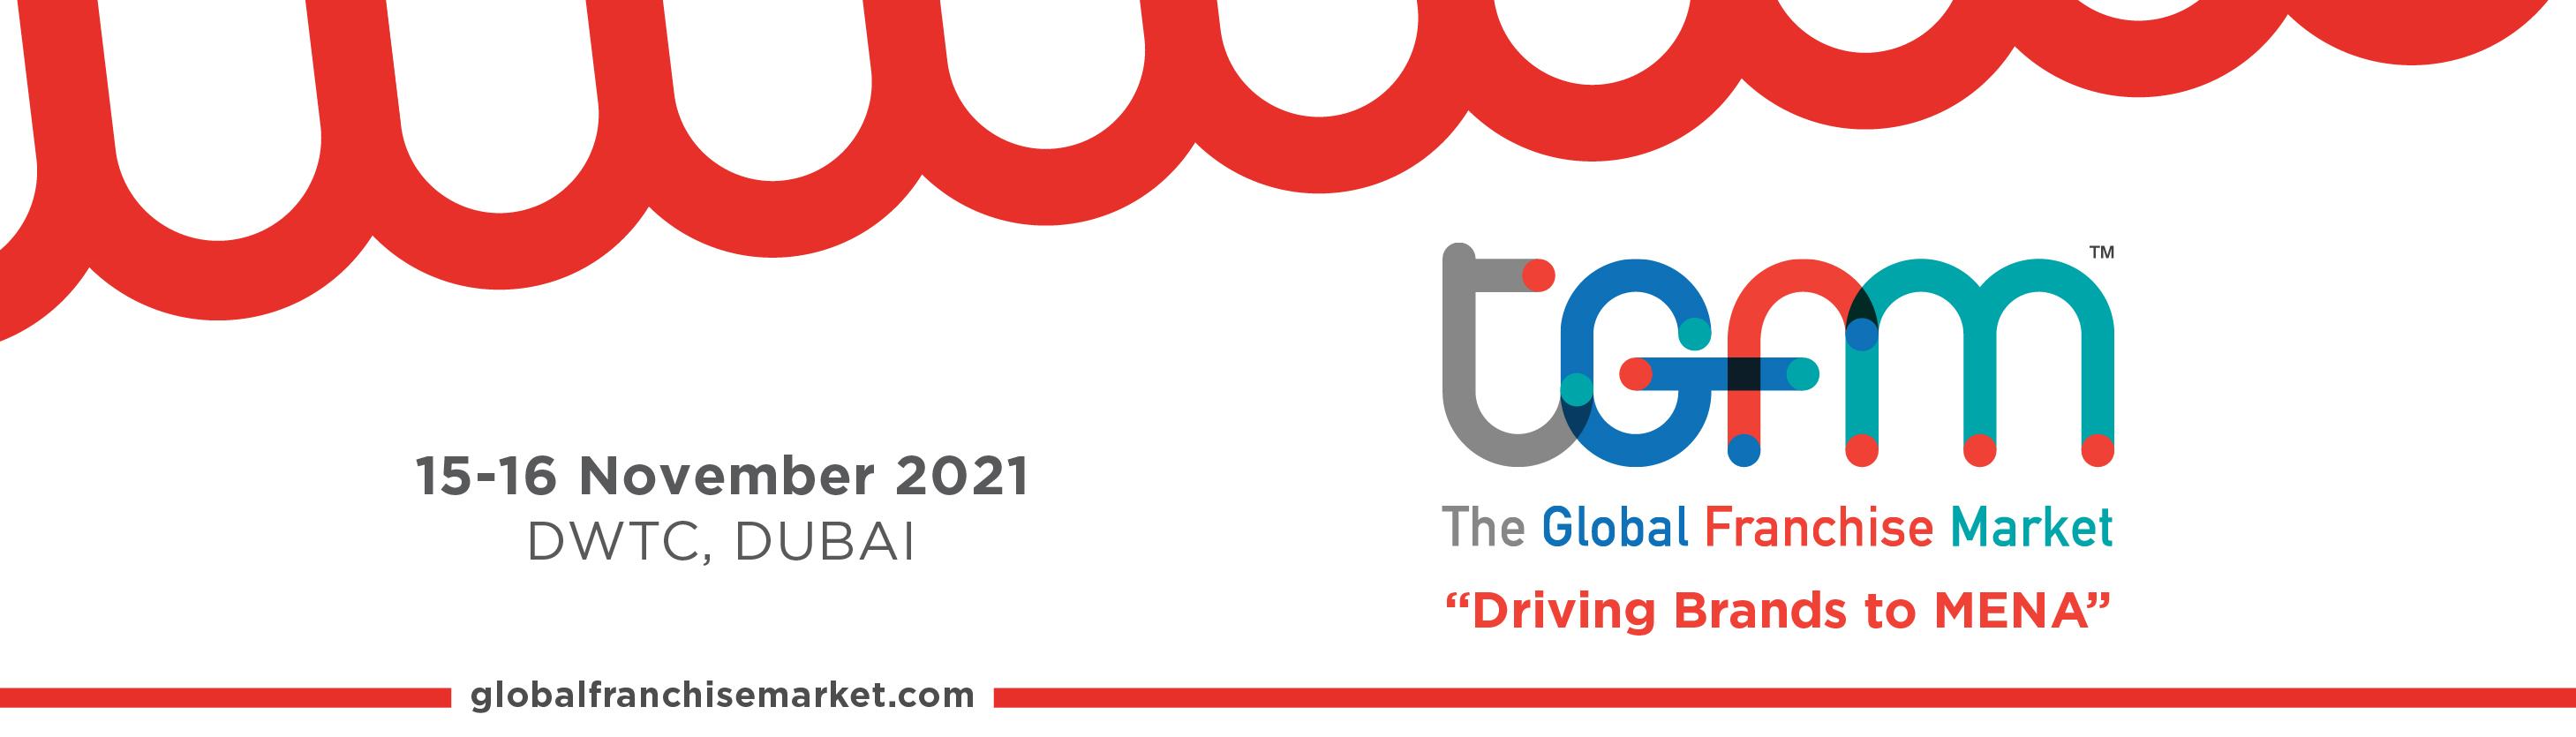 The Global Franchise Market 2021